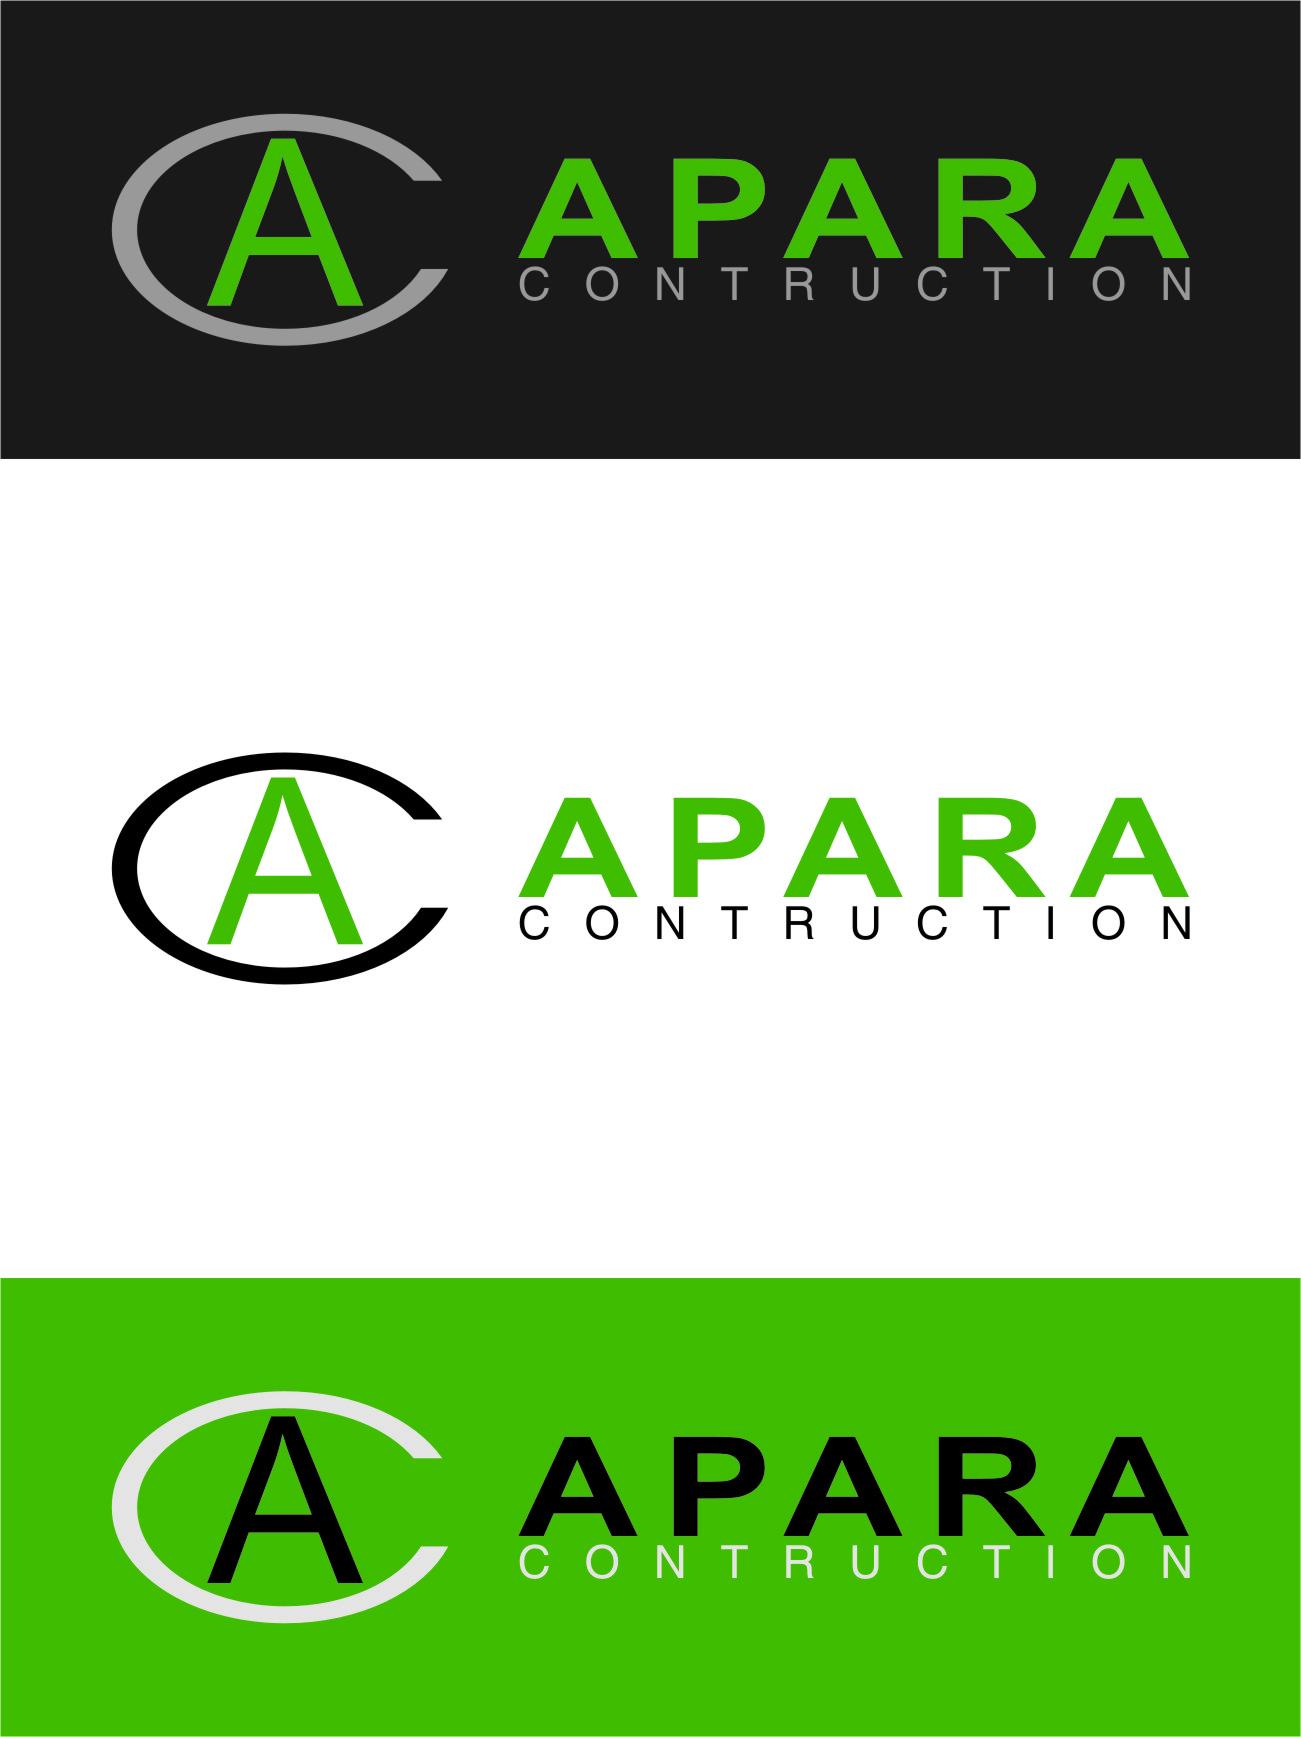 Logo Design by RasYa Muhammad Athaya - Entry No. 32 in the Logo Design Contest Apara Construction Logo Design.